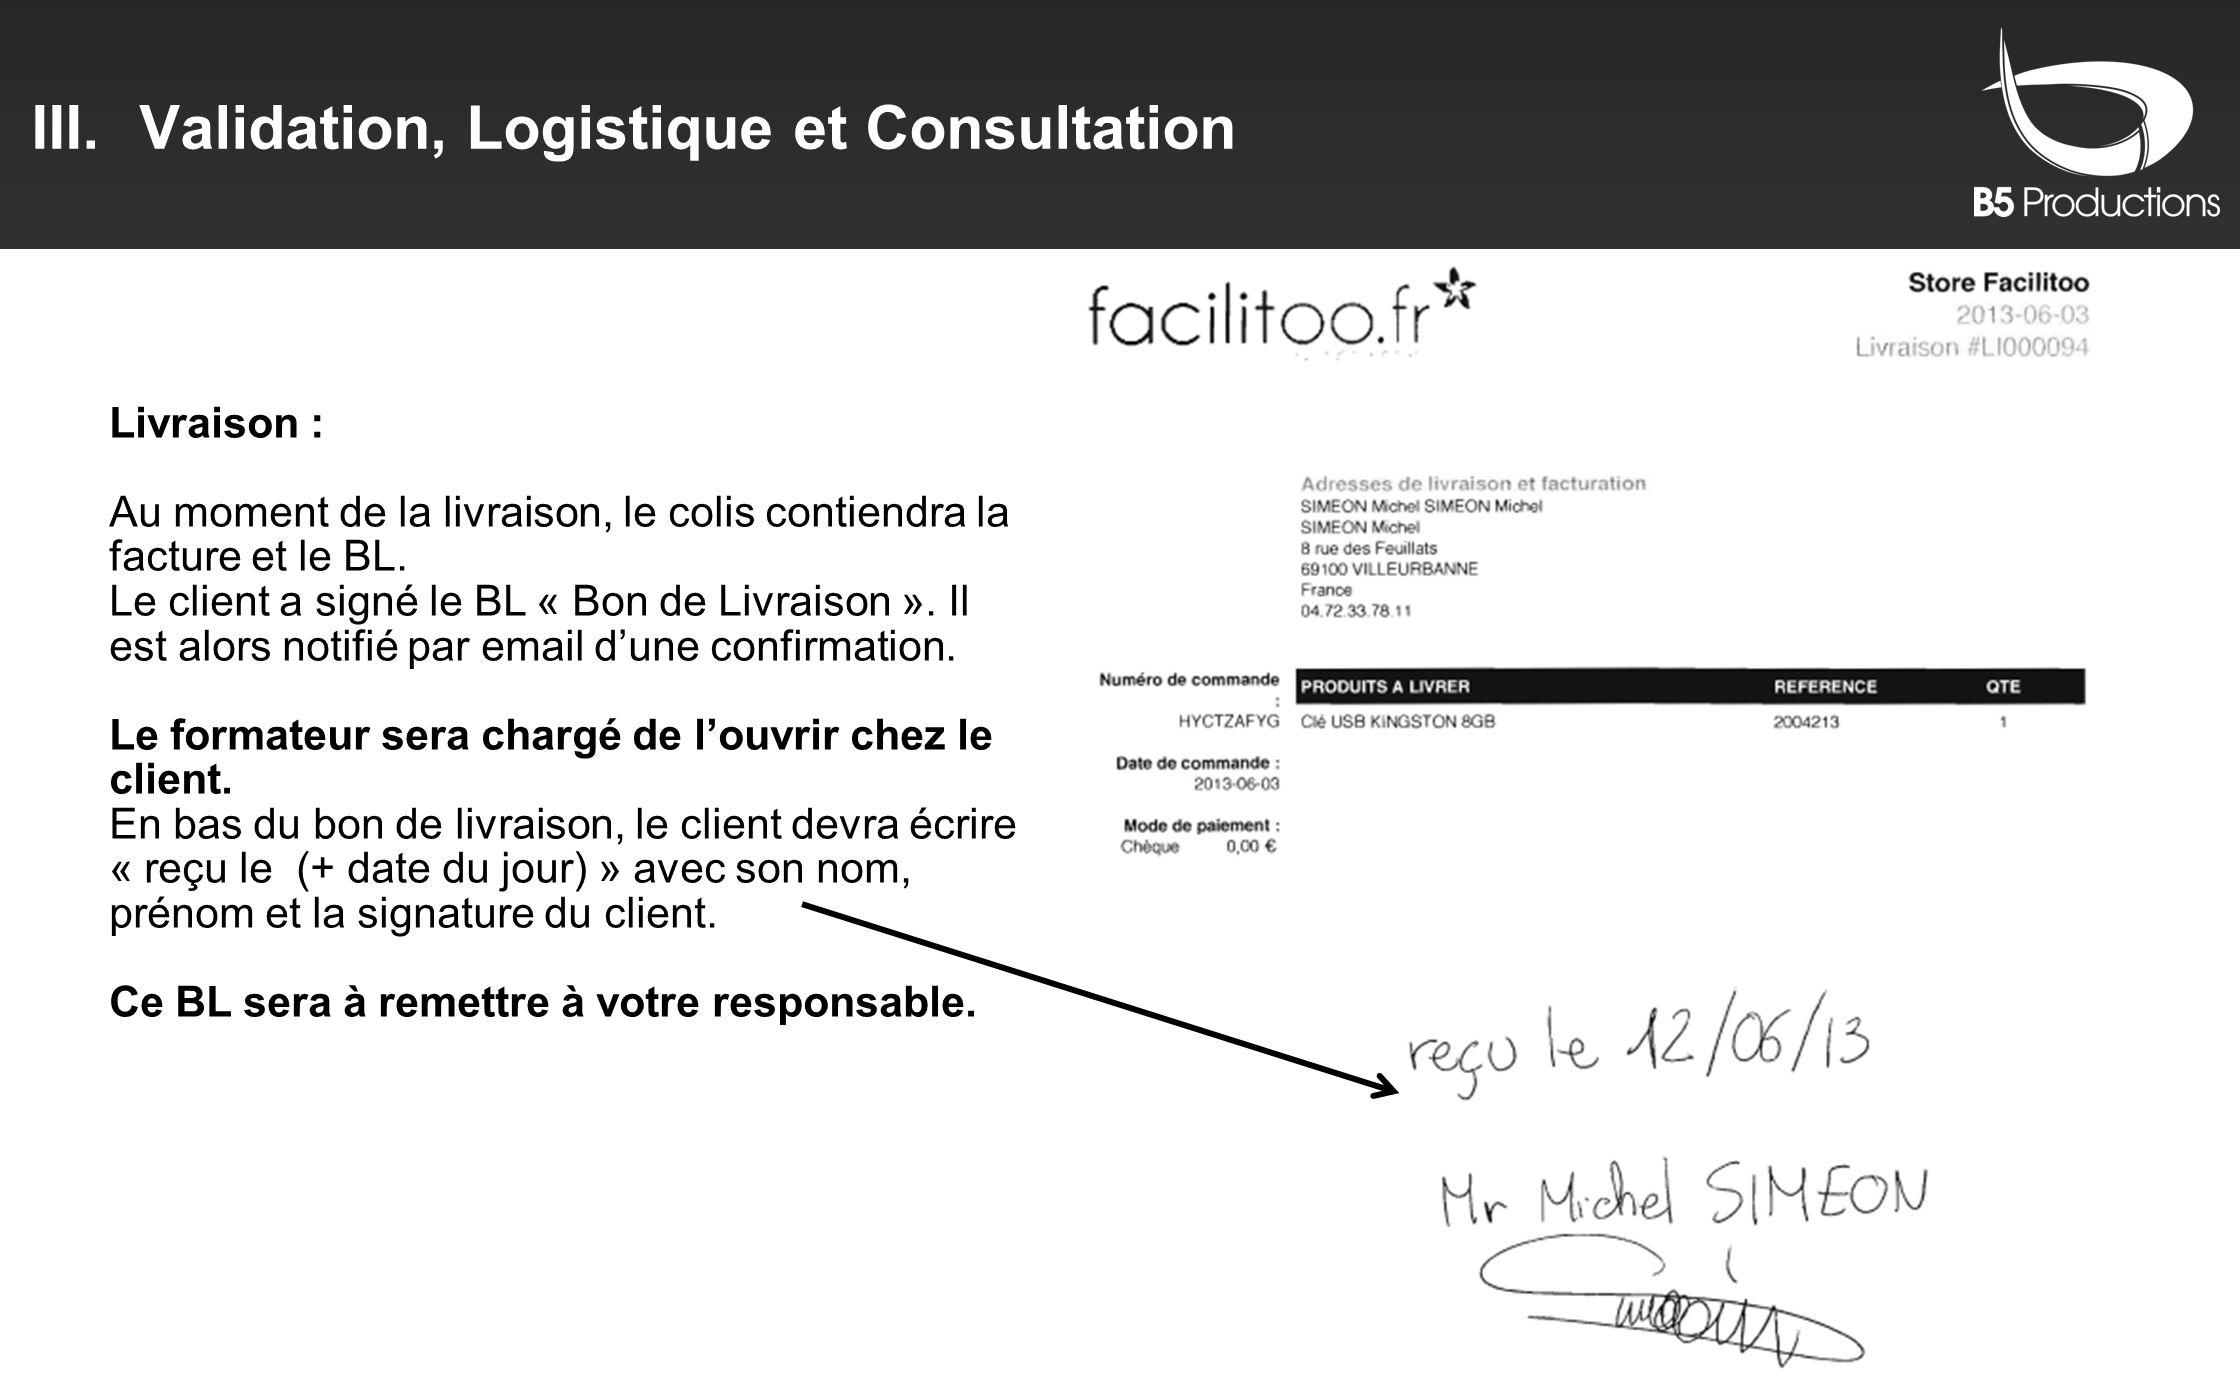 Validation, Logistique et Consultation